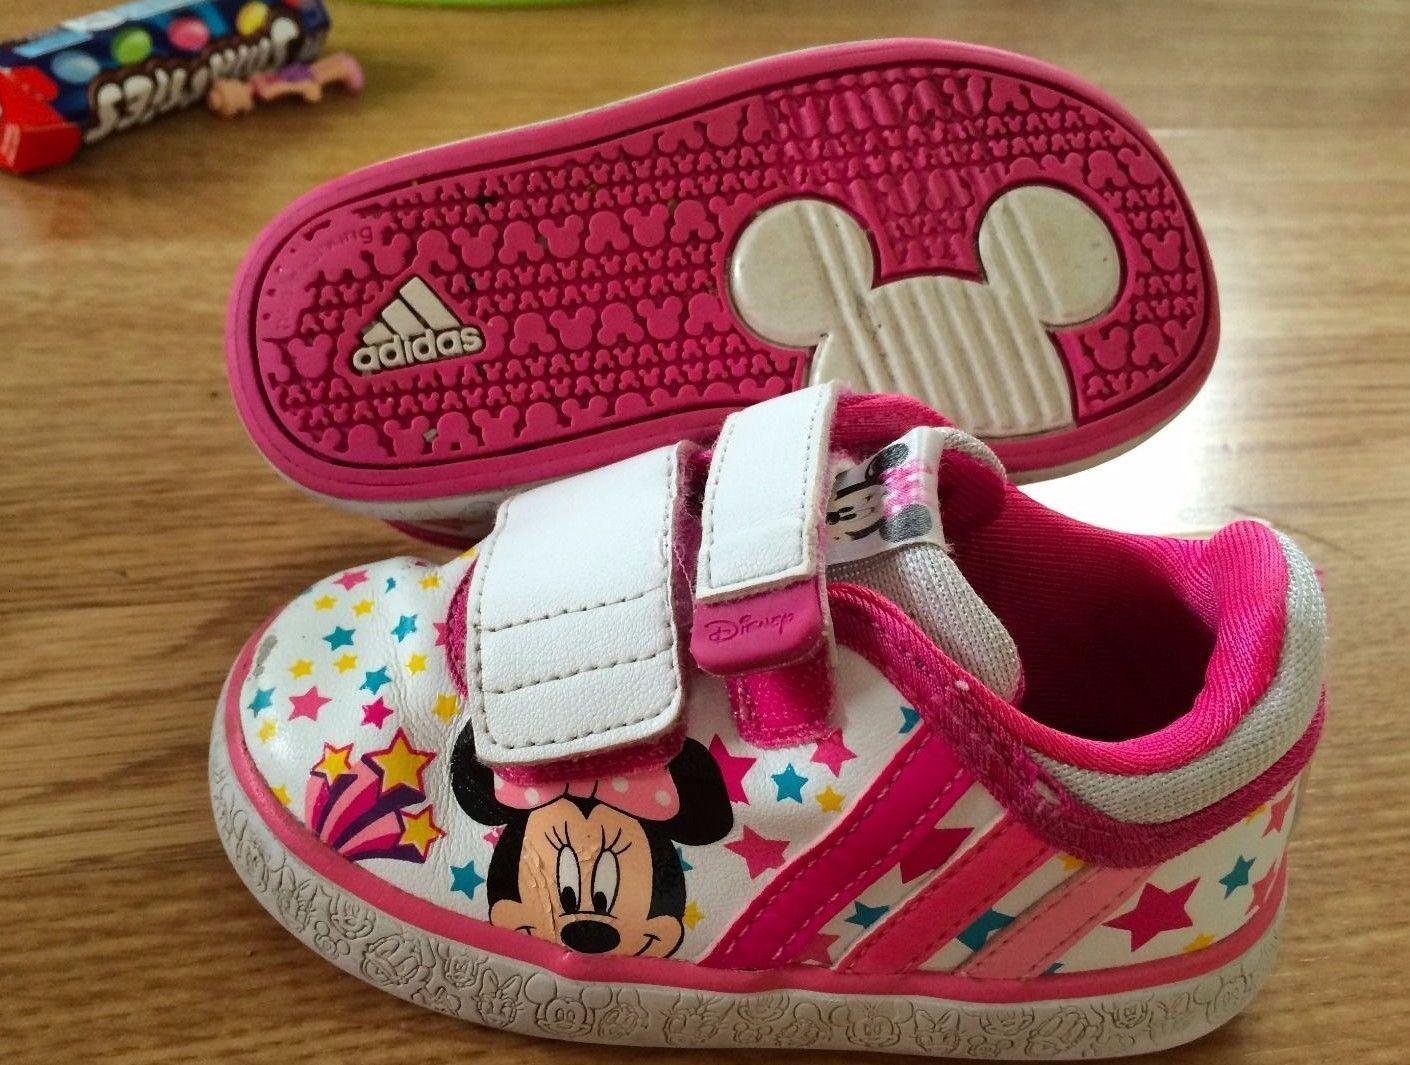 Cute Adidas 5k Shoes Mouse Minnie Infant Size Disney Trainers Girls nk08wXOP